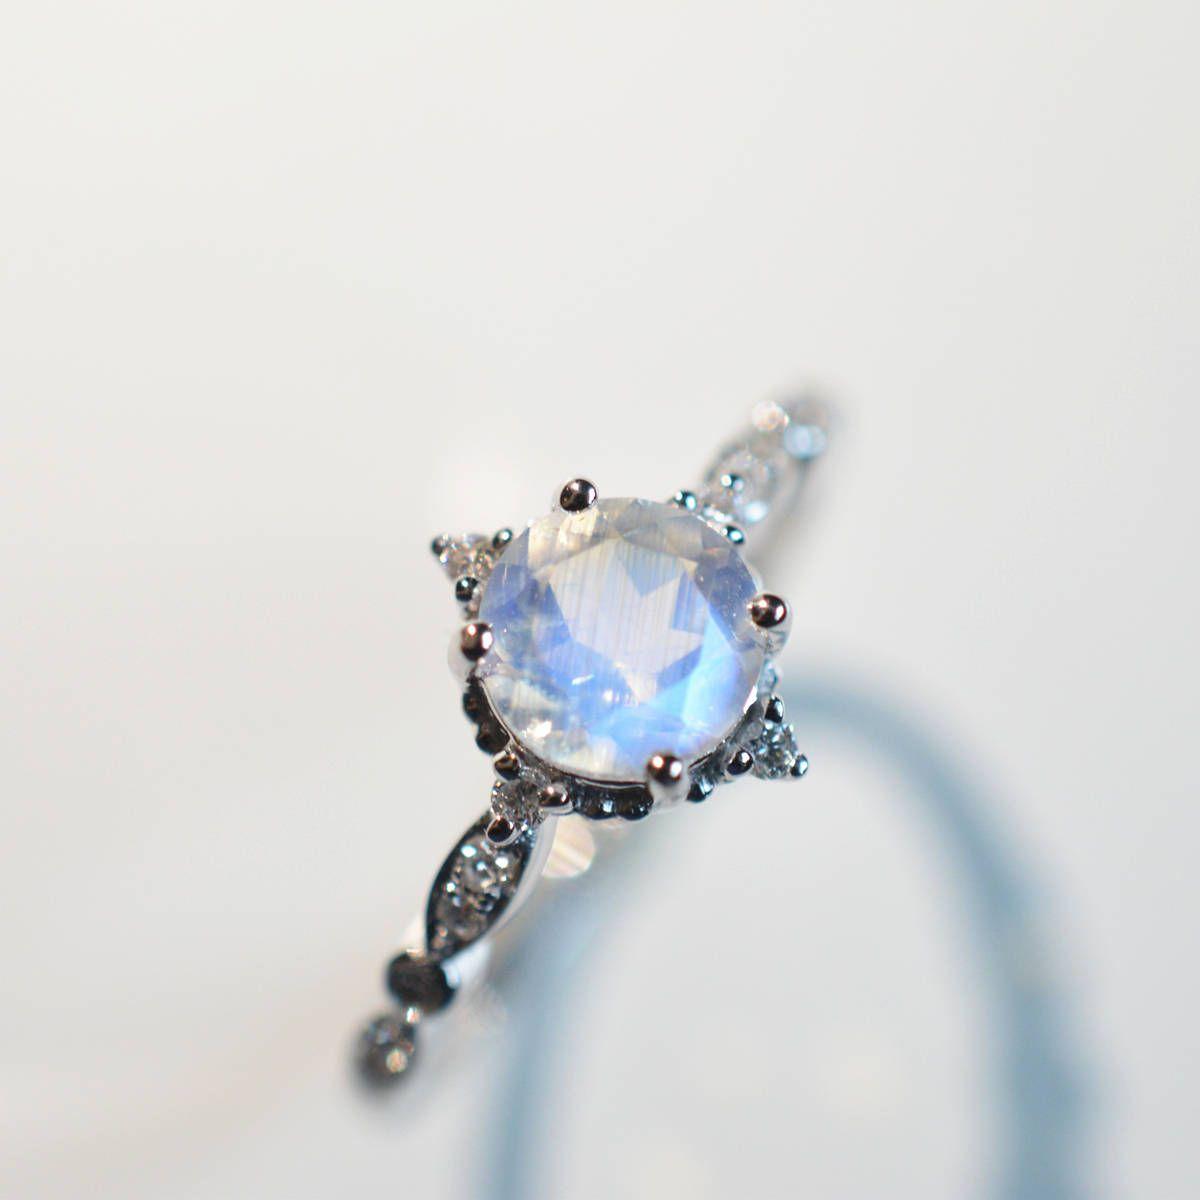 Moonstone Engagement Ring Blue 18k 14k Gold Wedding Antique Vintage Engagment